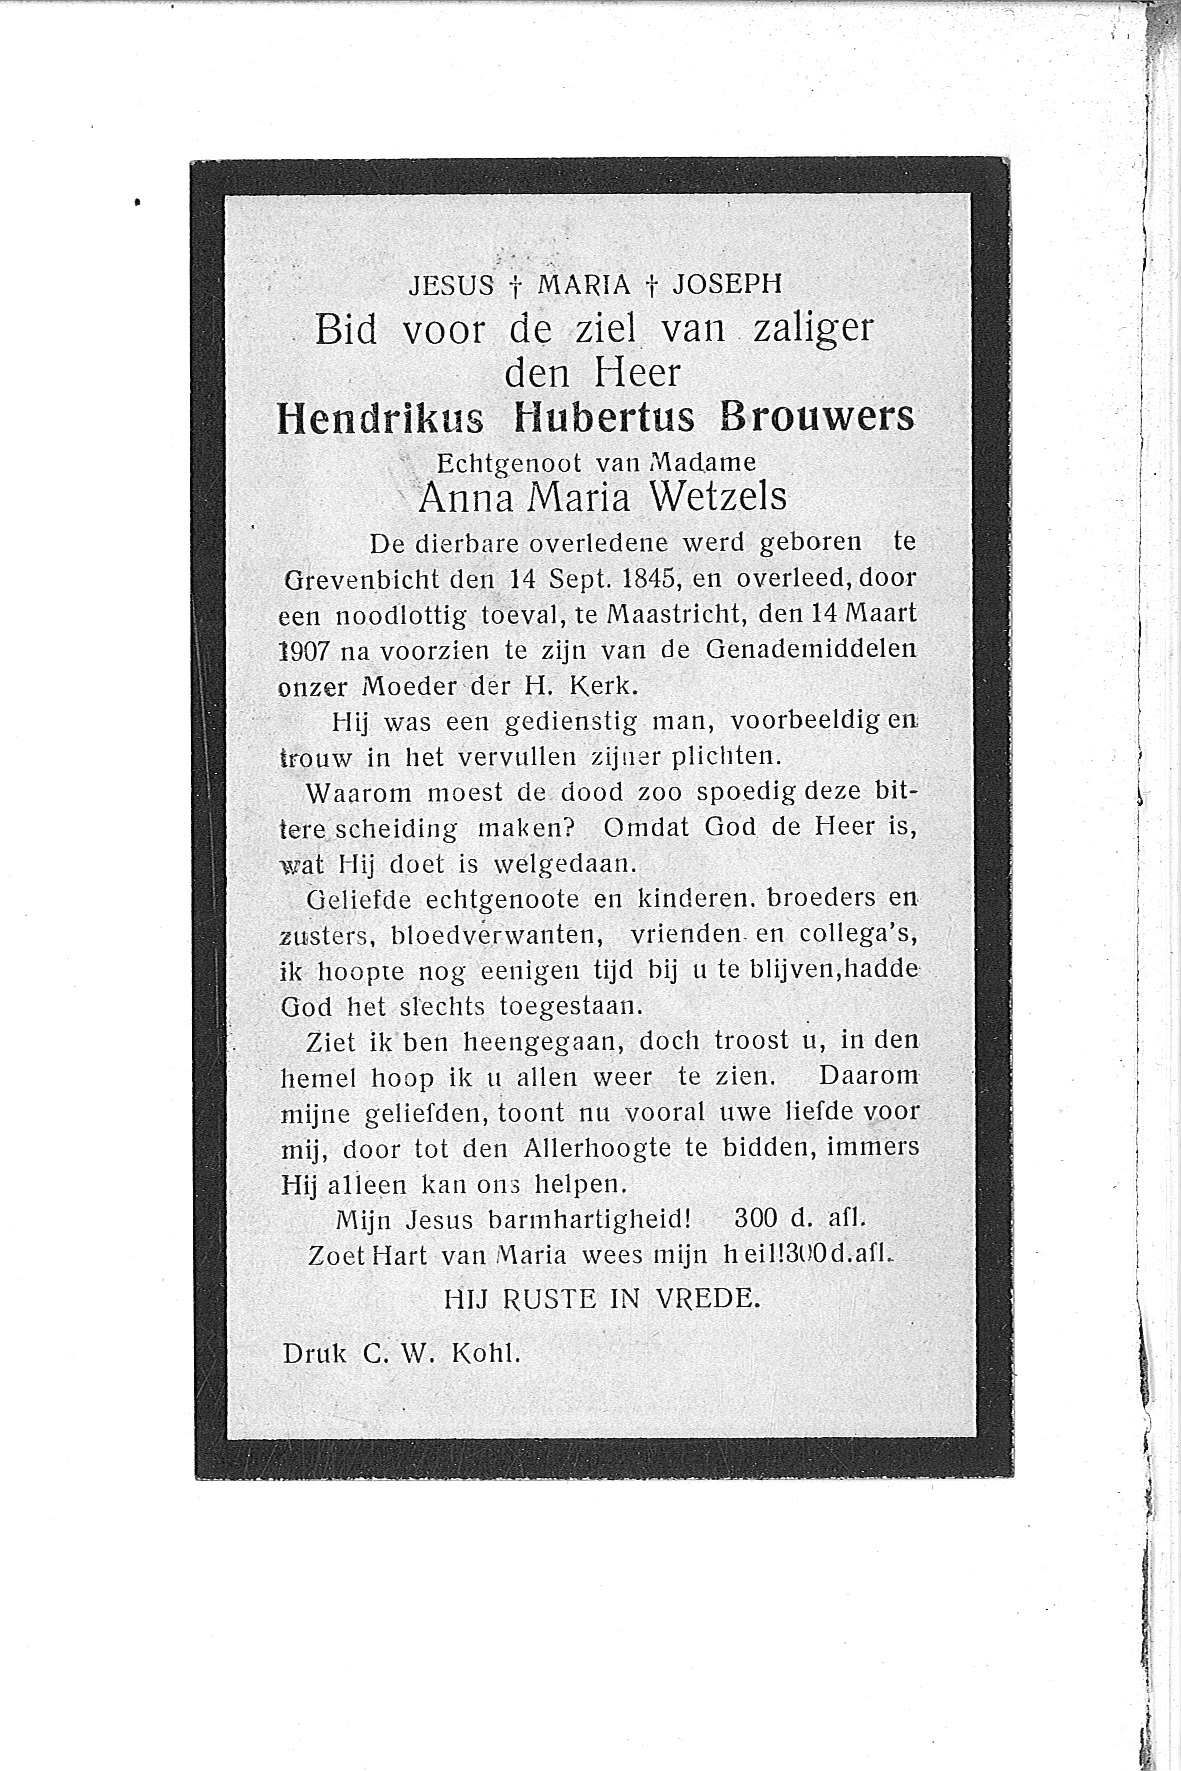 Henricus Hubertus (1907) 20110805165022_00056.jpg